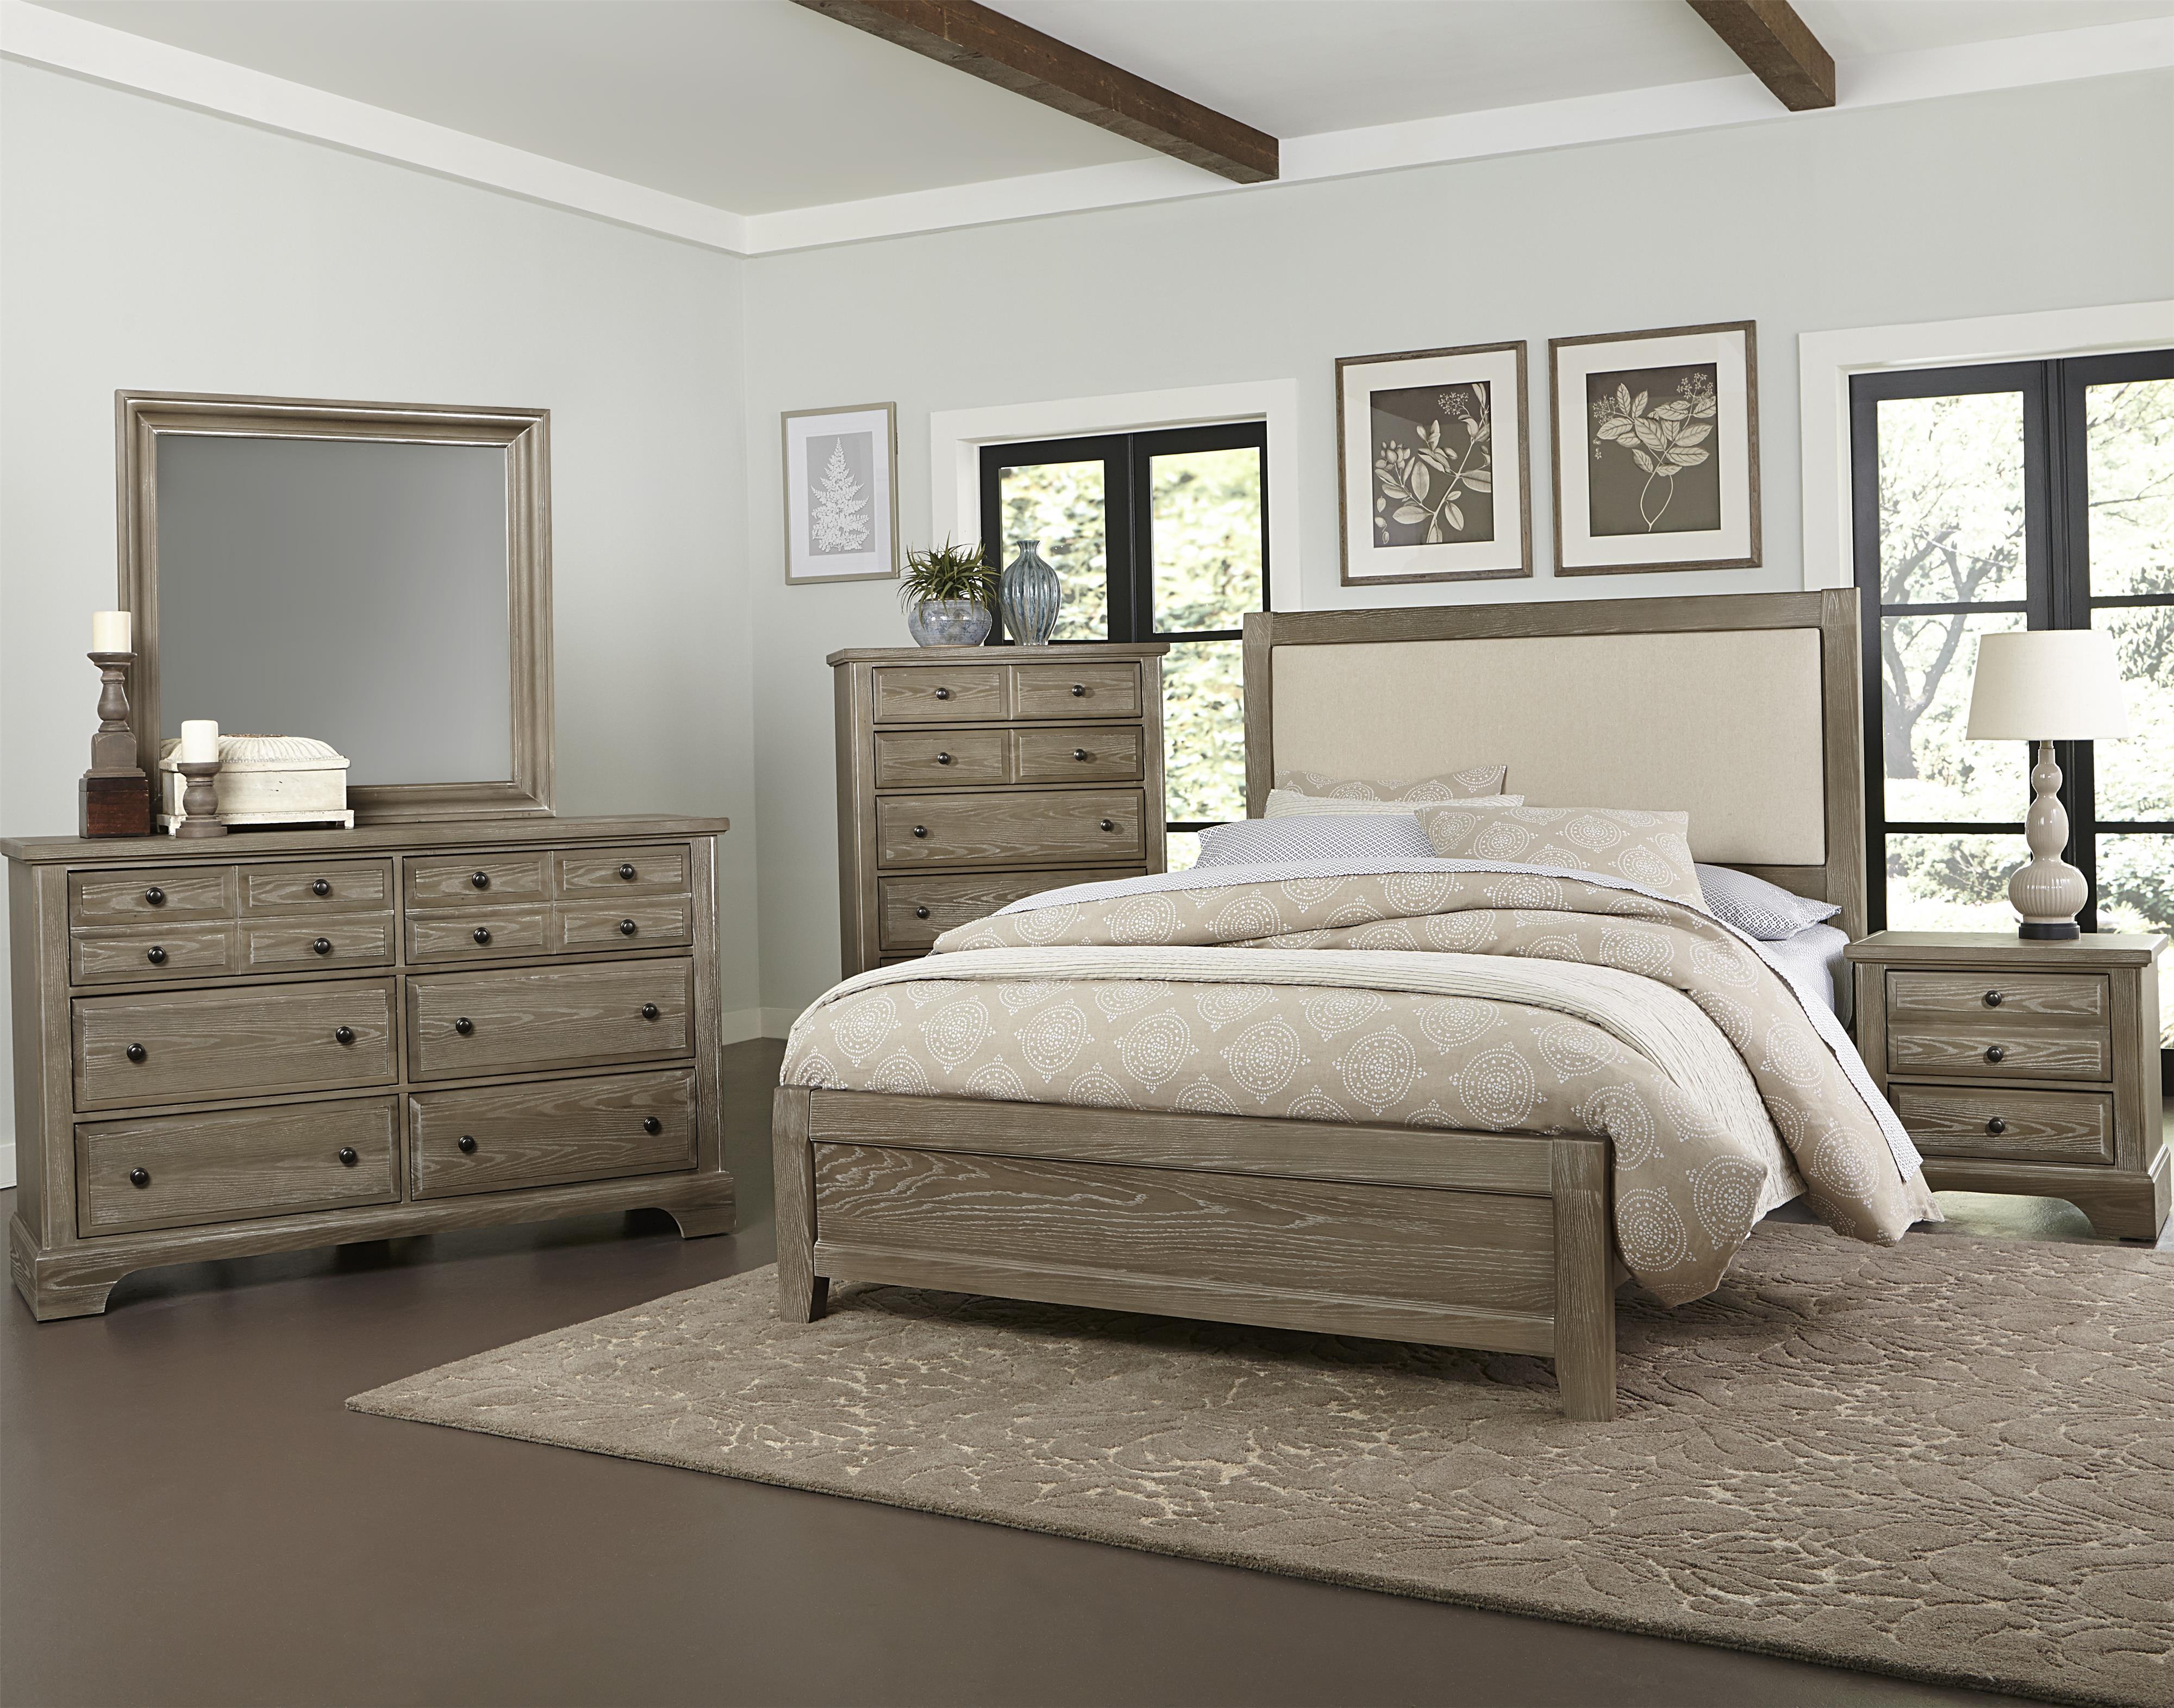 Vaughan Bassett Bedford King Bedroom Group - Item Number: BB81 K Bedroom Group 2